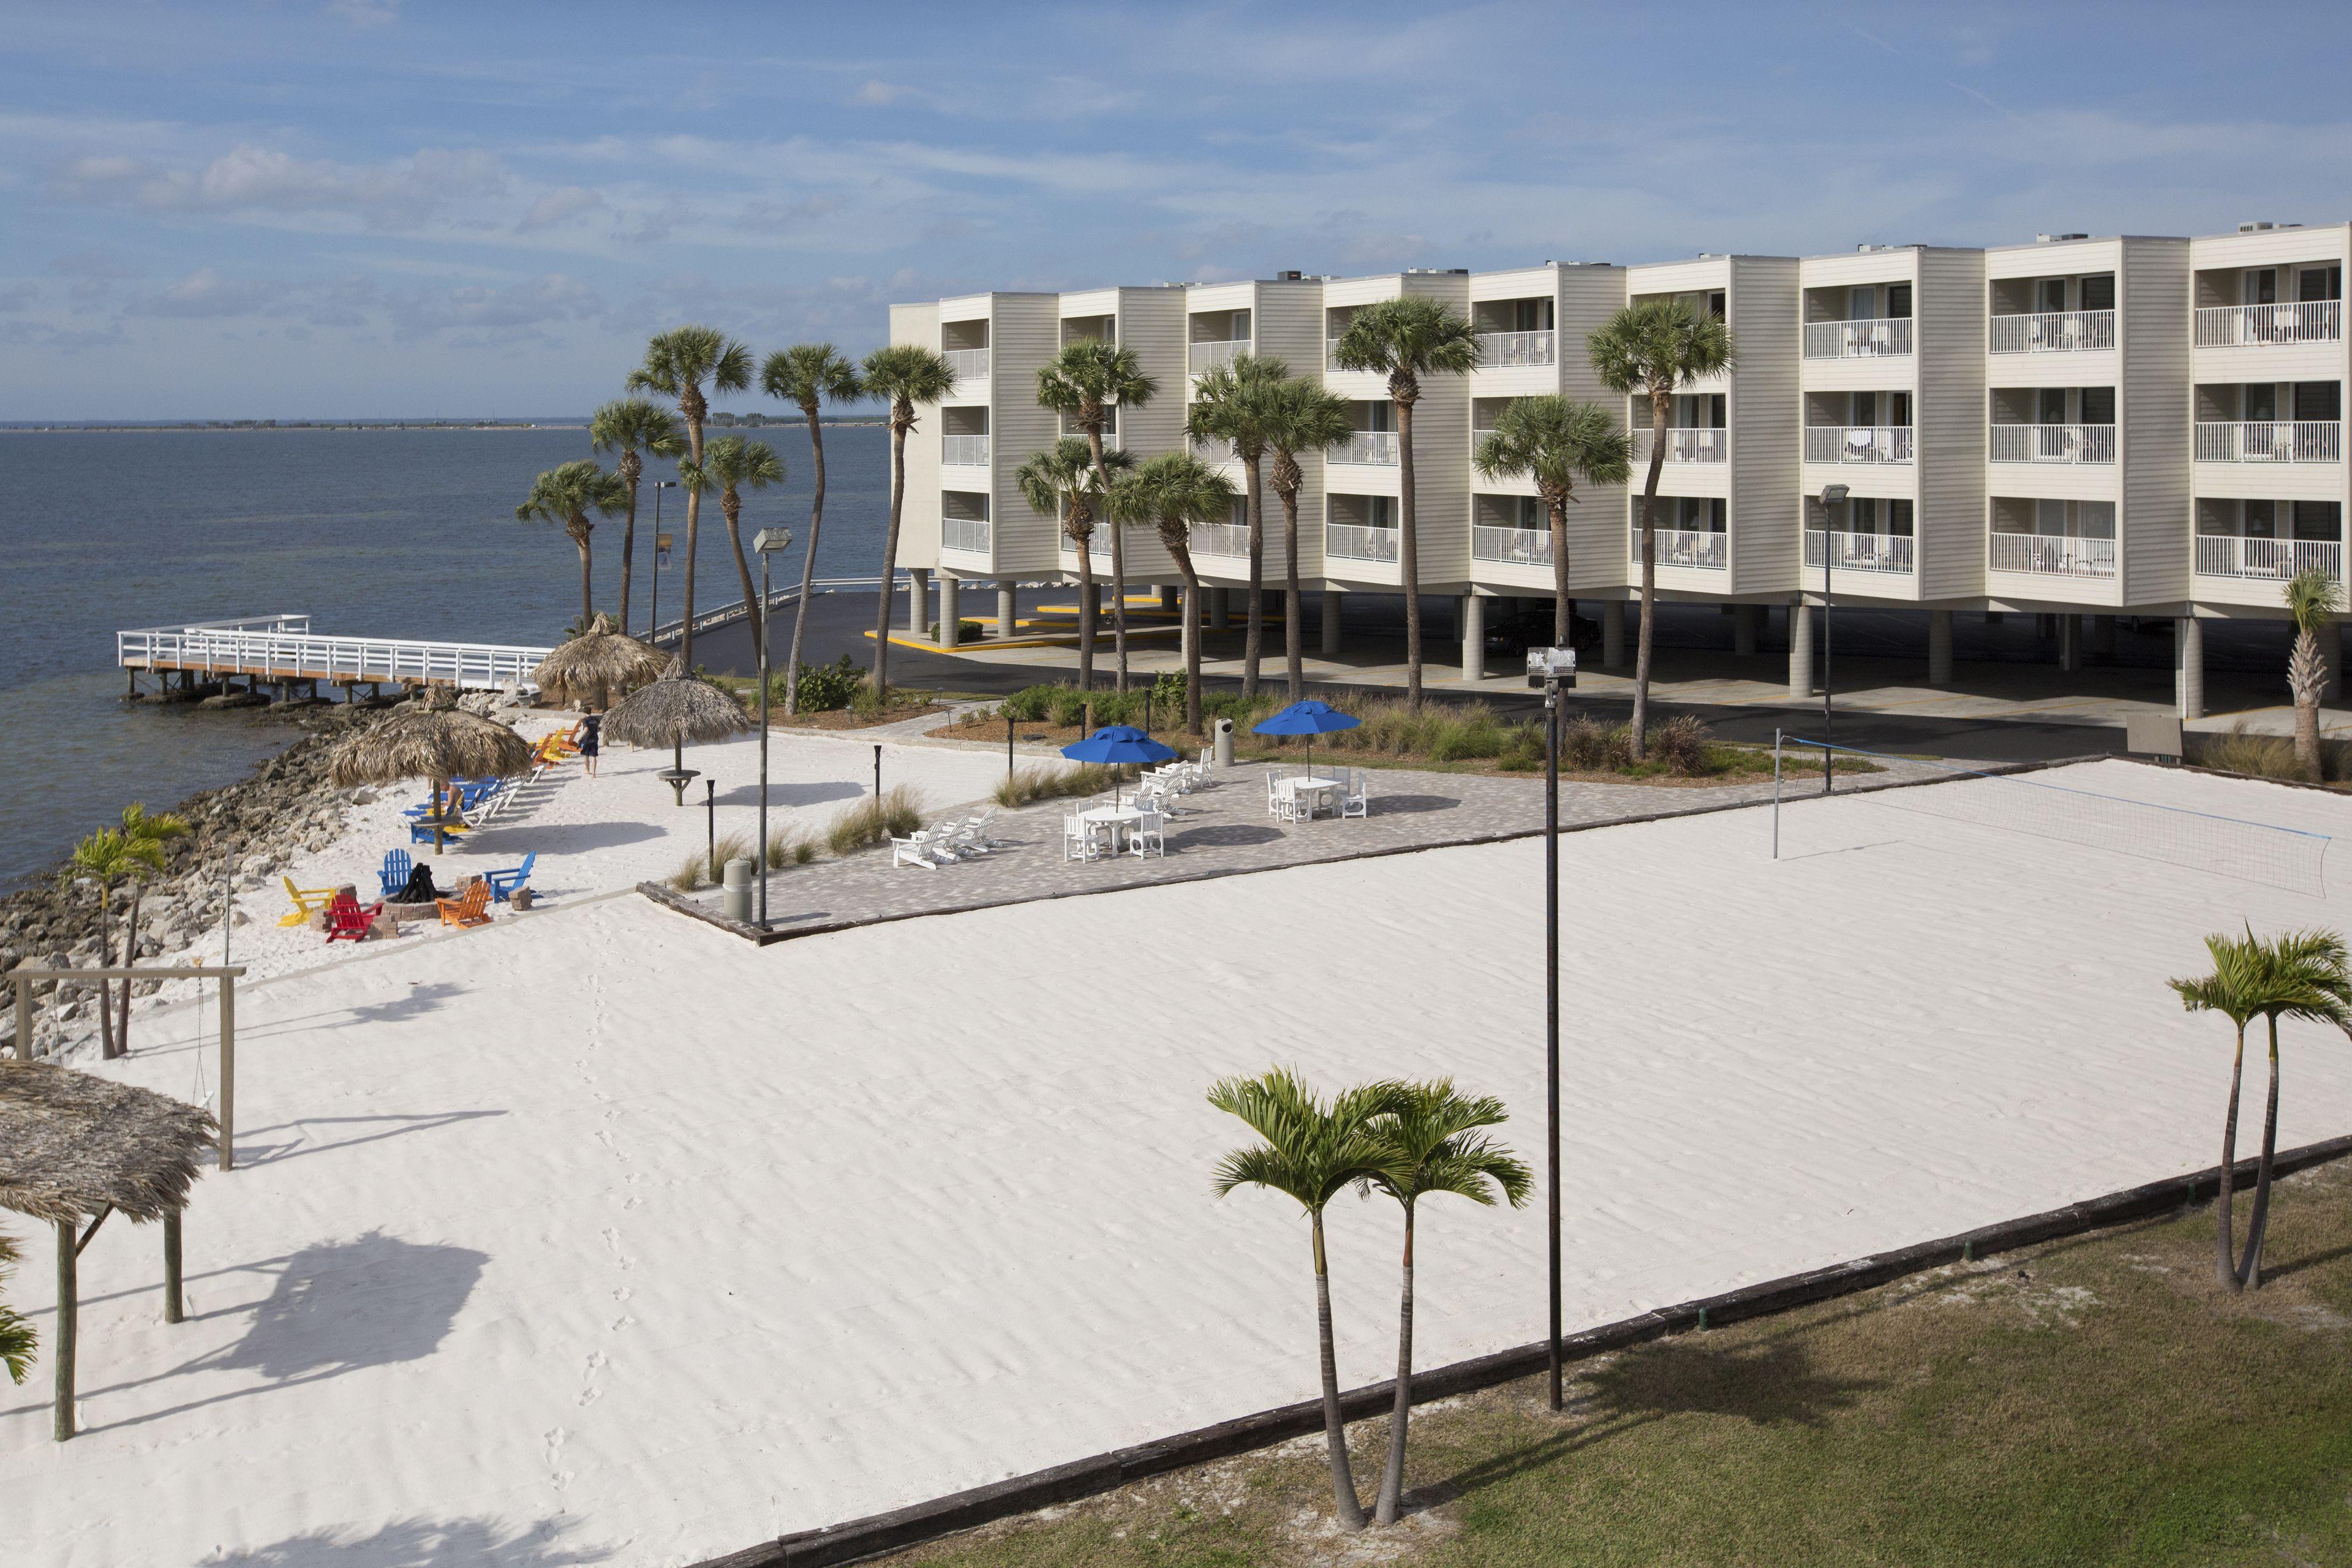 Courtesy of Sailport Waterfront Suites / Expedia